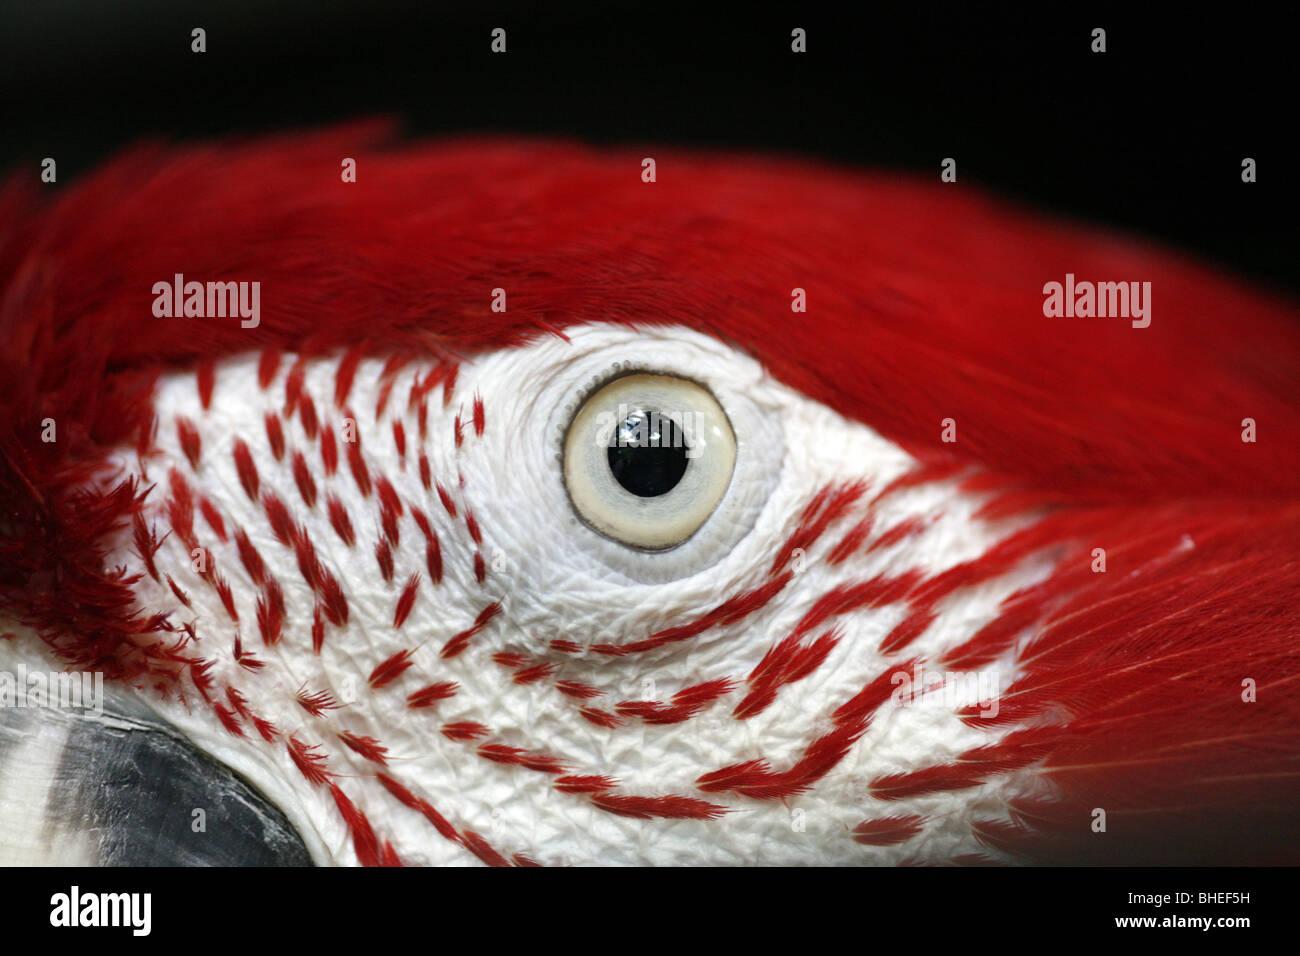 Parrots For Eyes Stockfotos & Parrots For Eyes Bilder - Alamy